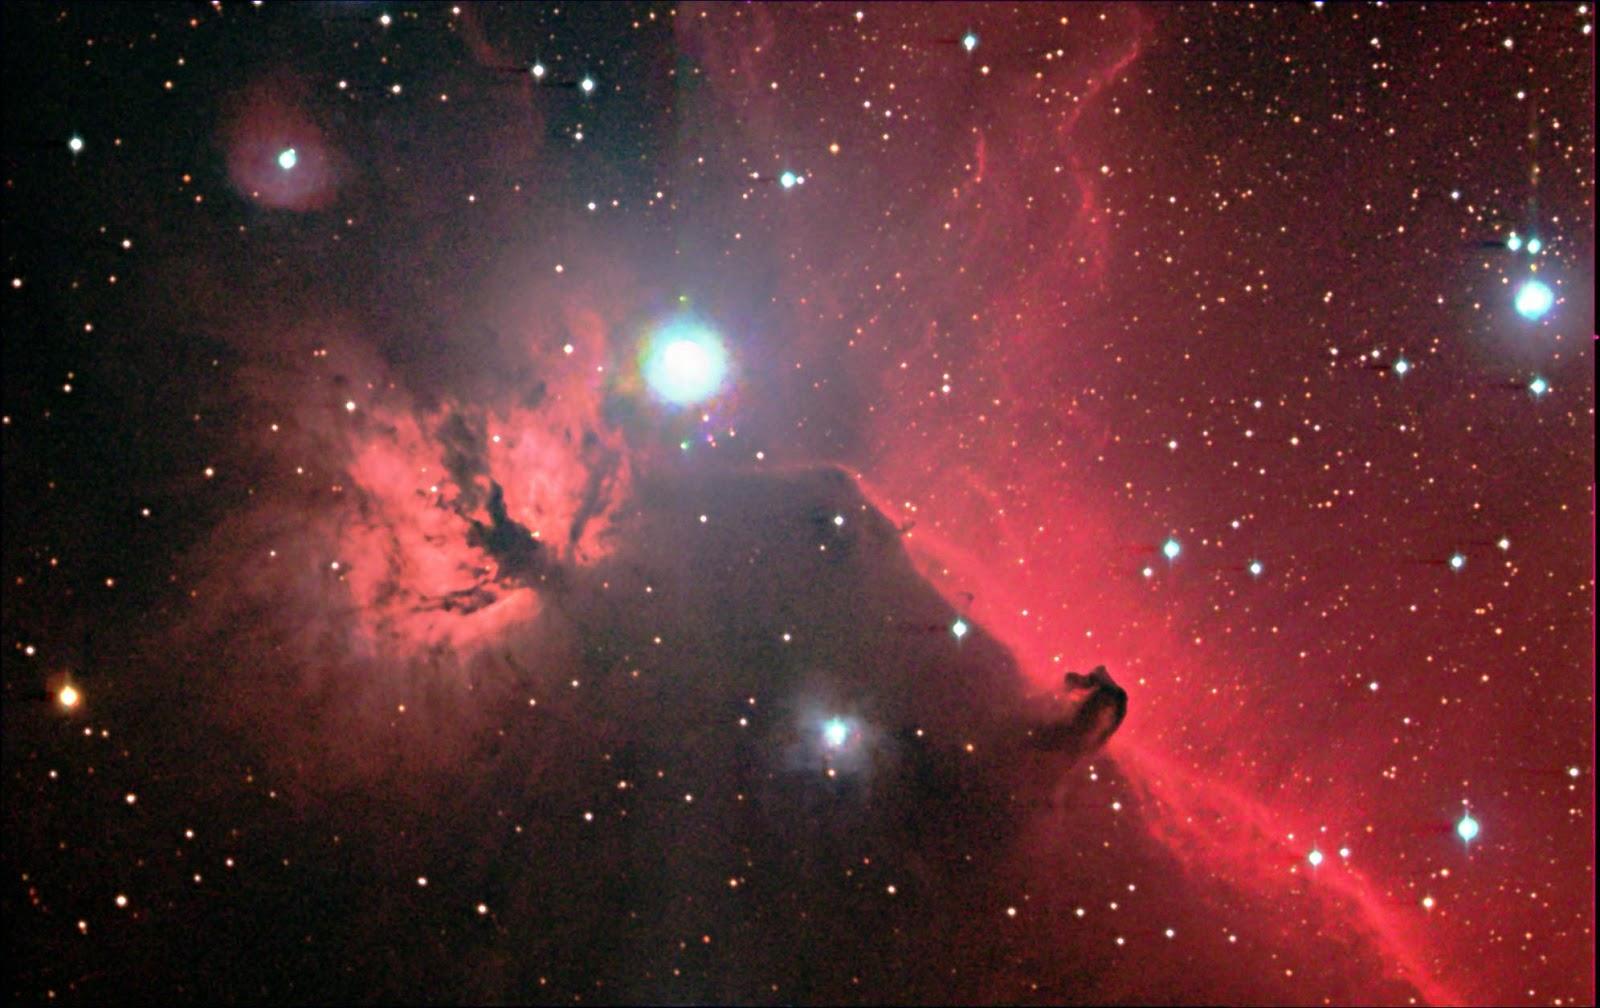 Good   Wallpaper Horse Nebula - Horsehead-Nebula-Wallpaper-HD-08  You Should Have_152118.jpg